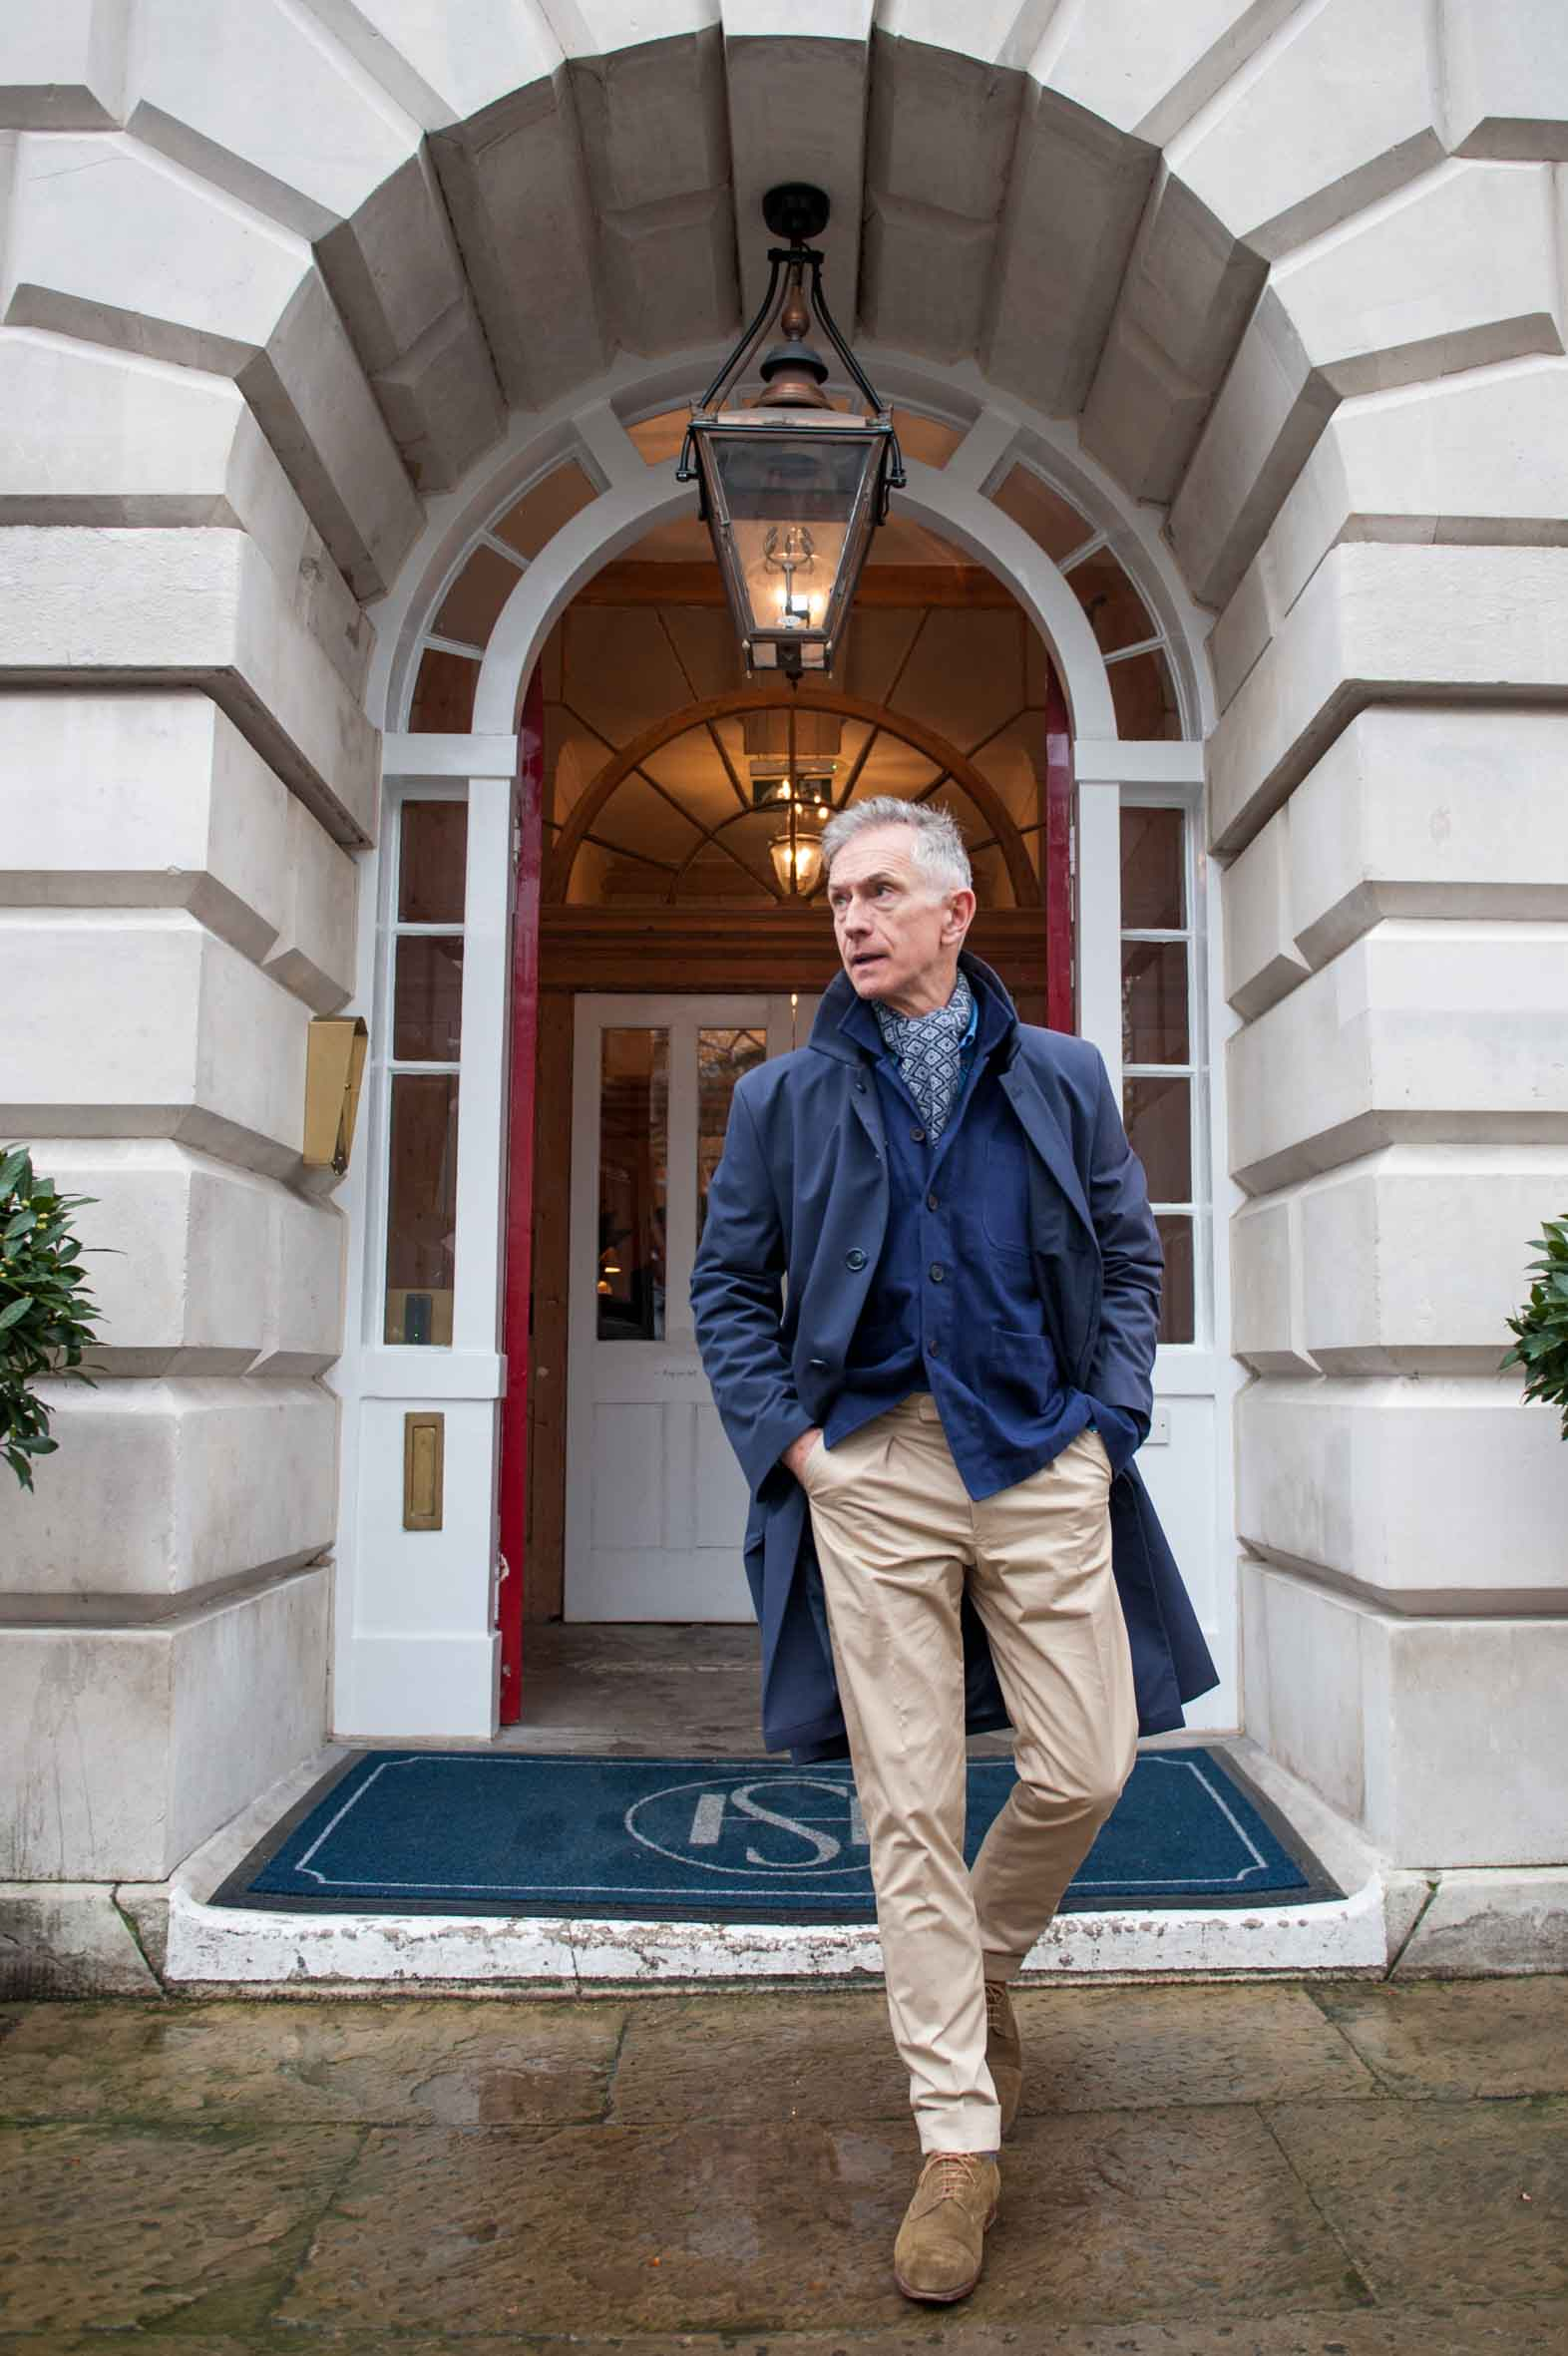 susannah-hall-tailor-perfect-trousers-grey-fox-blog-dormeuil-cotton-chinos-ventile-raincoat-made-britain.jpg